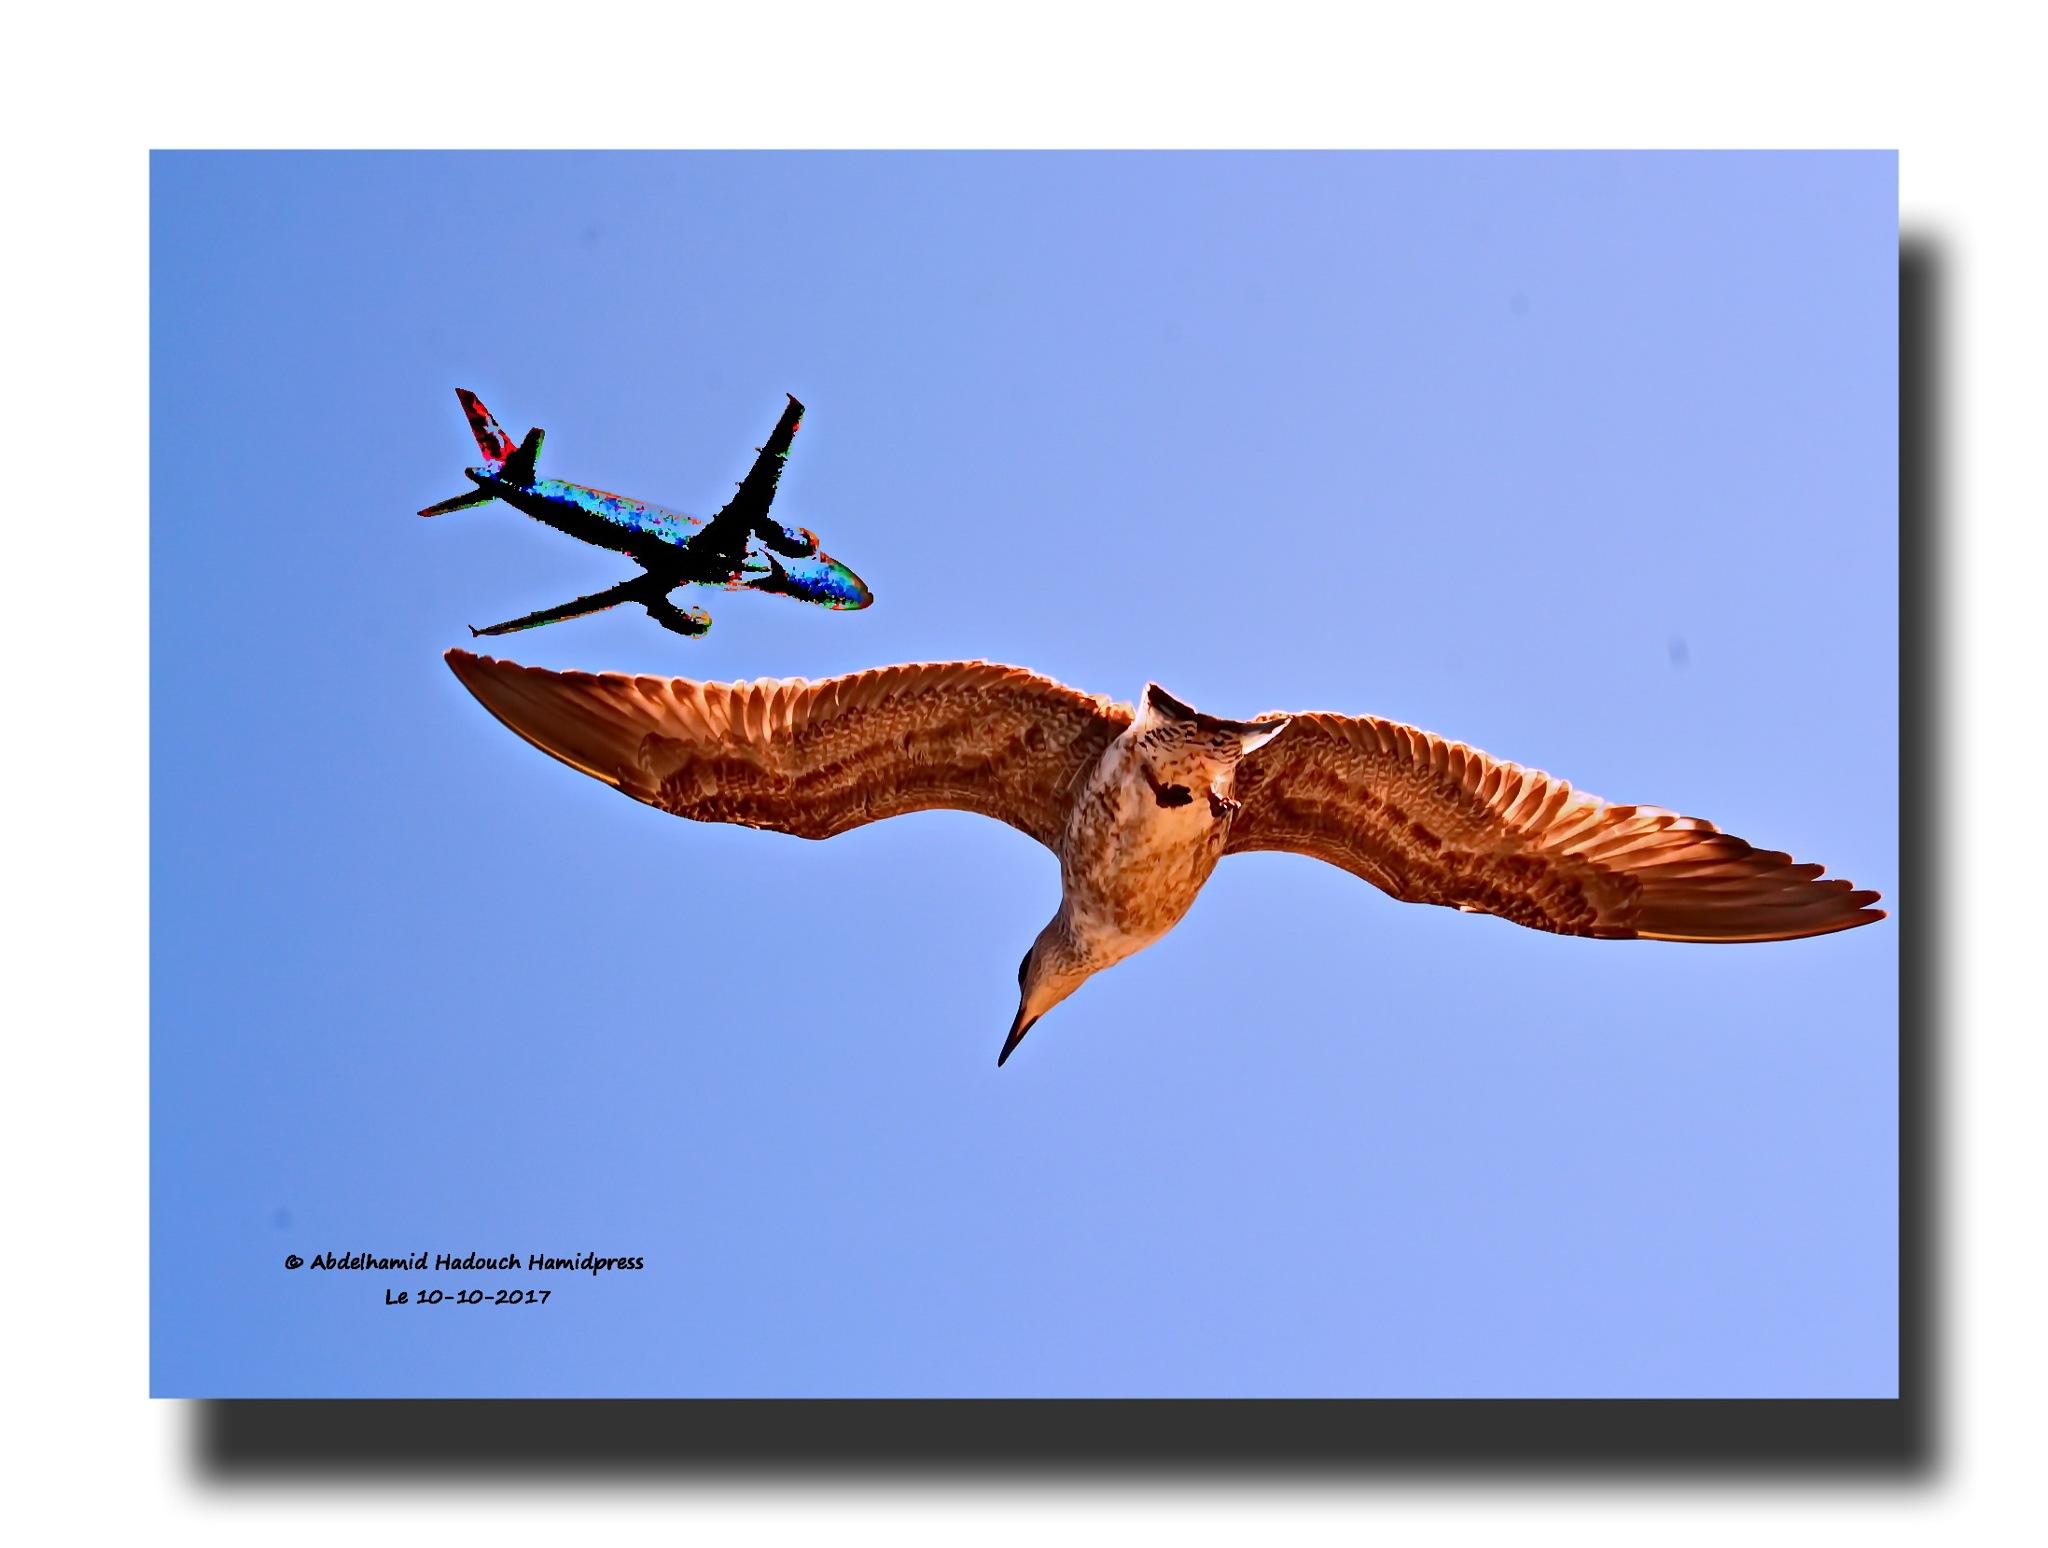 Mouette et Avion  by Abdelhamid Hadouch